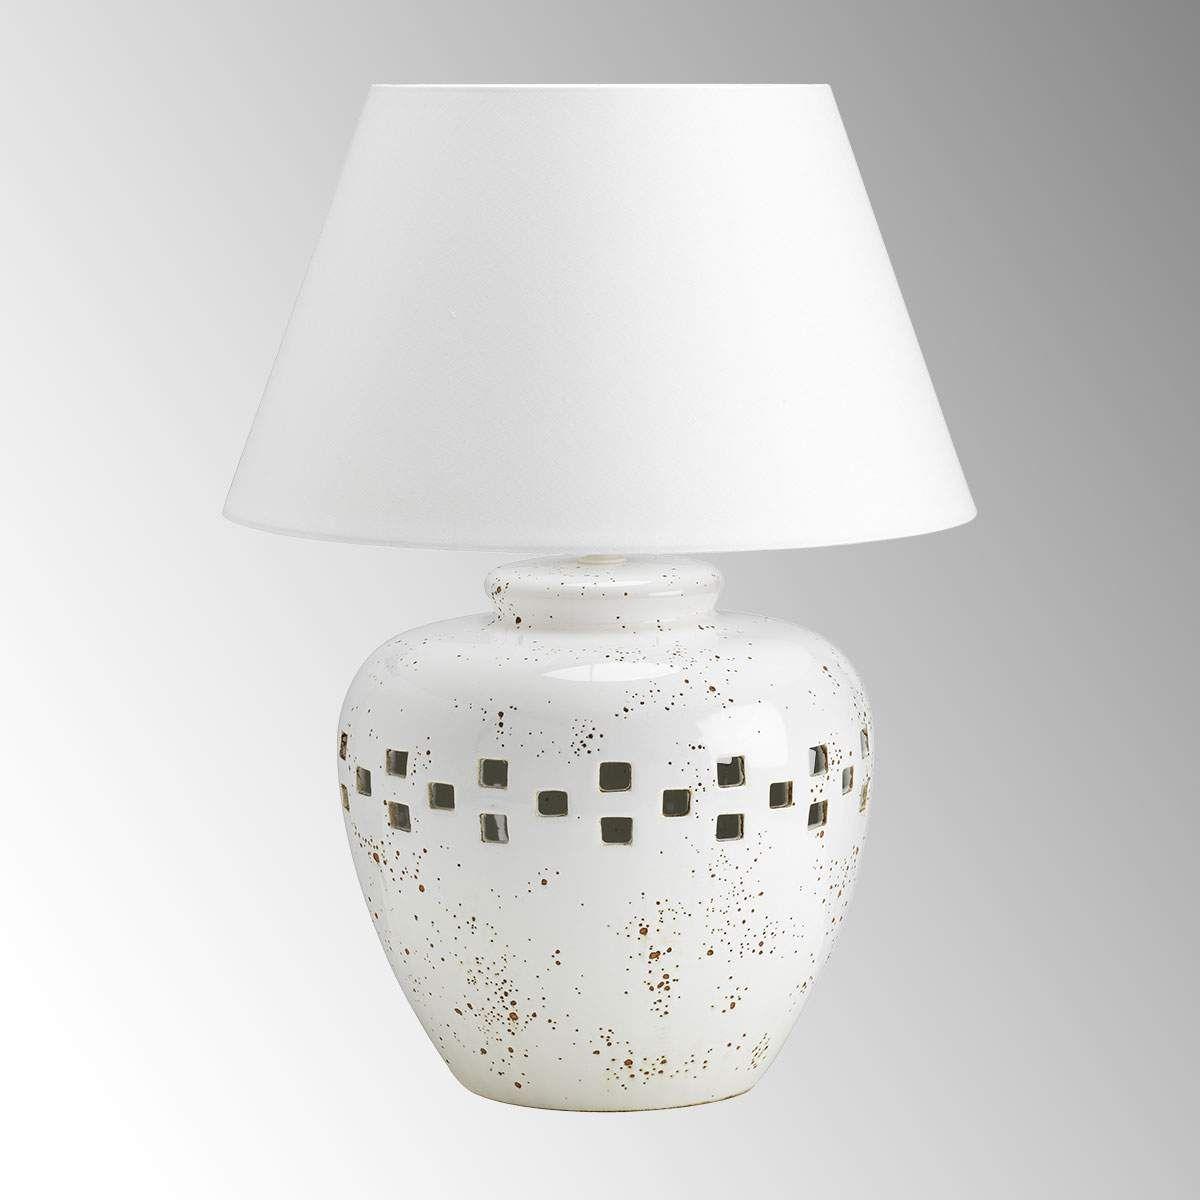 Lampe Poser 60 À De Antica Hauteur Toscana CmLuminaires TPulwZOkXi